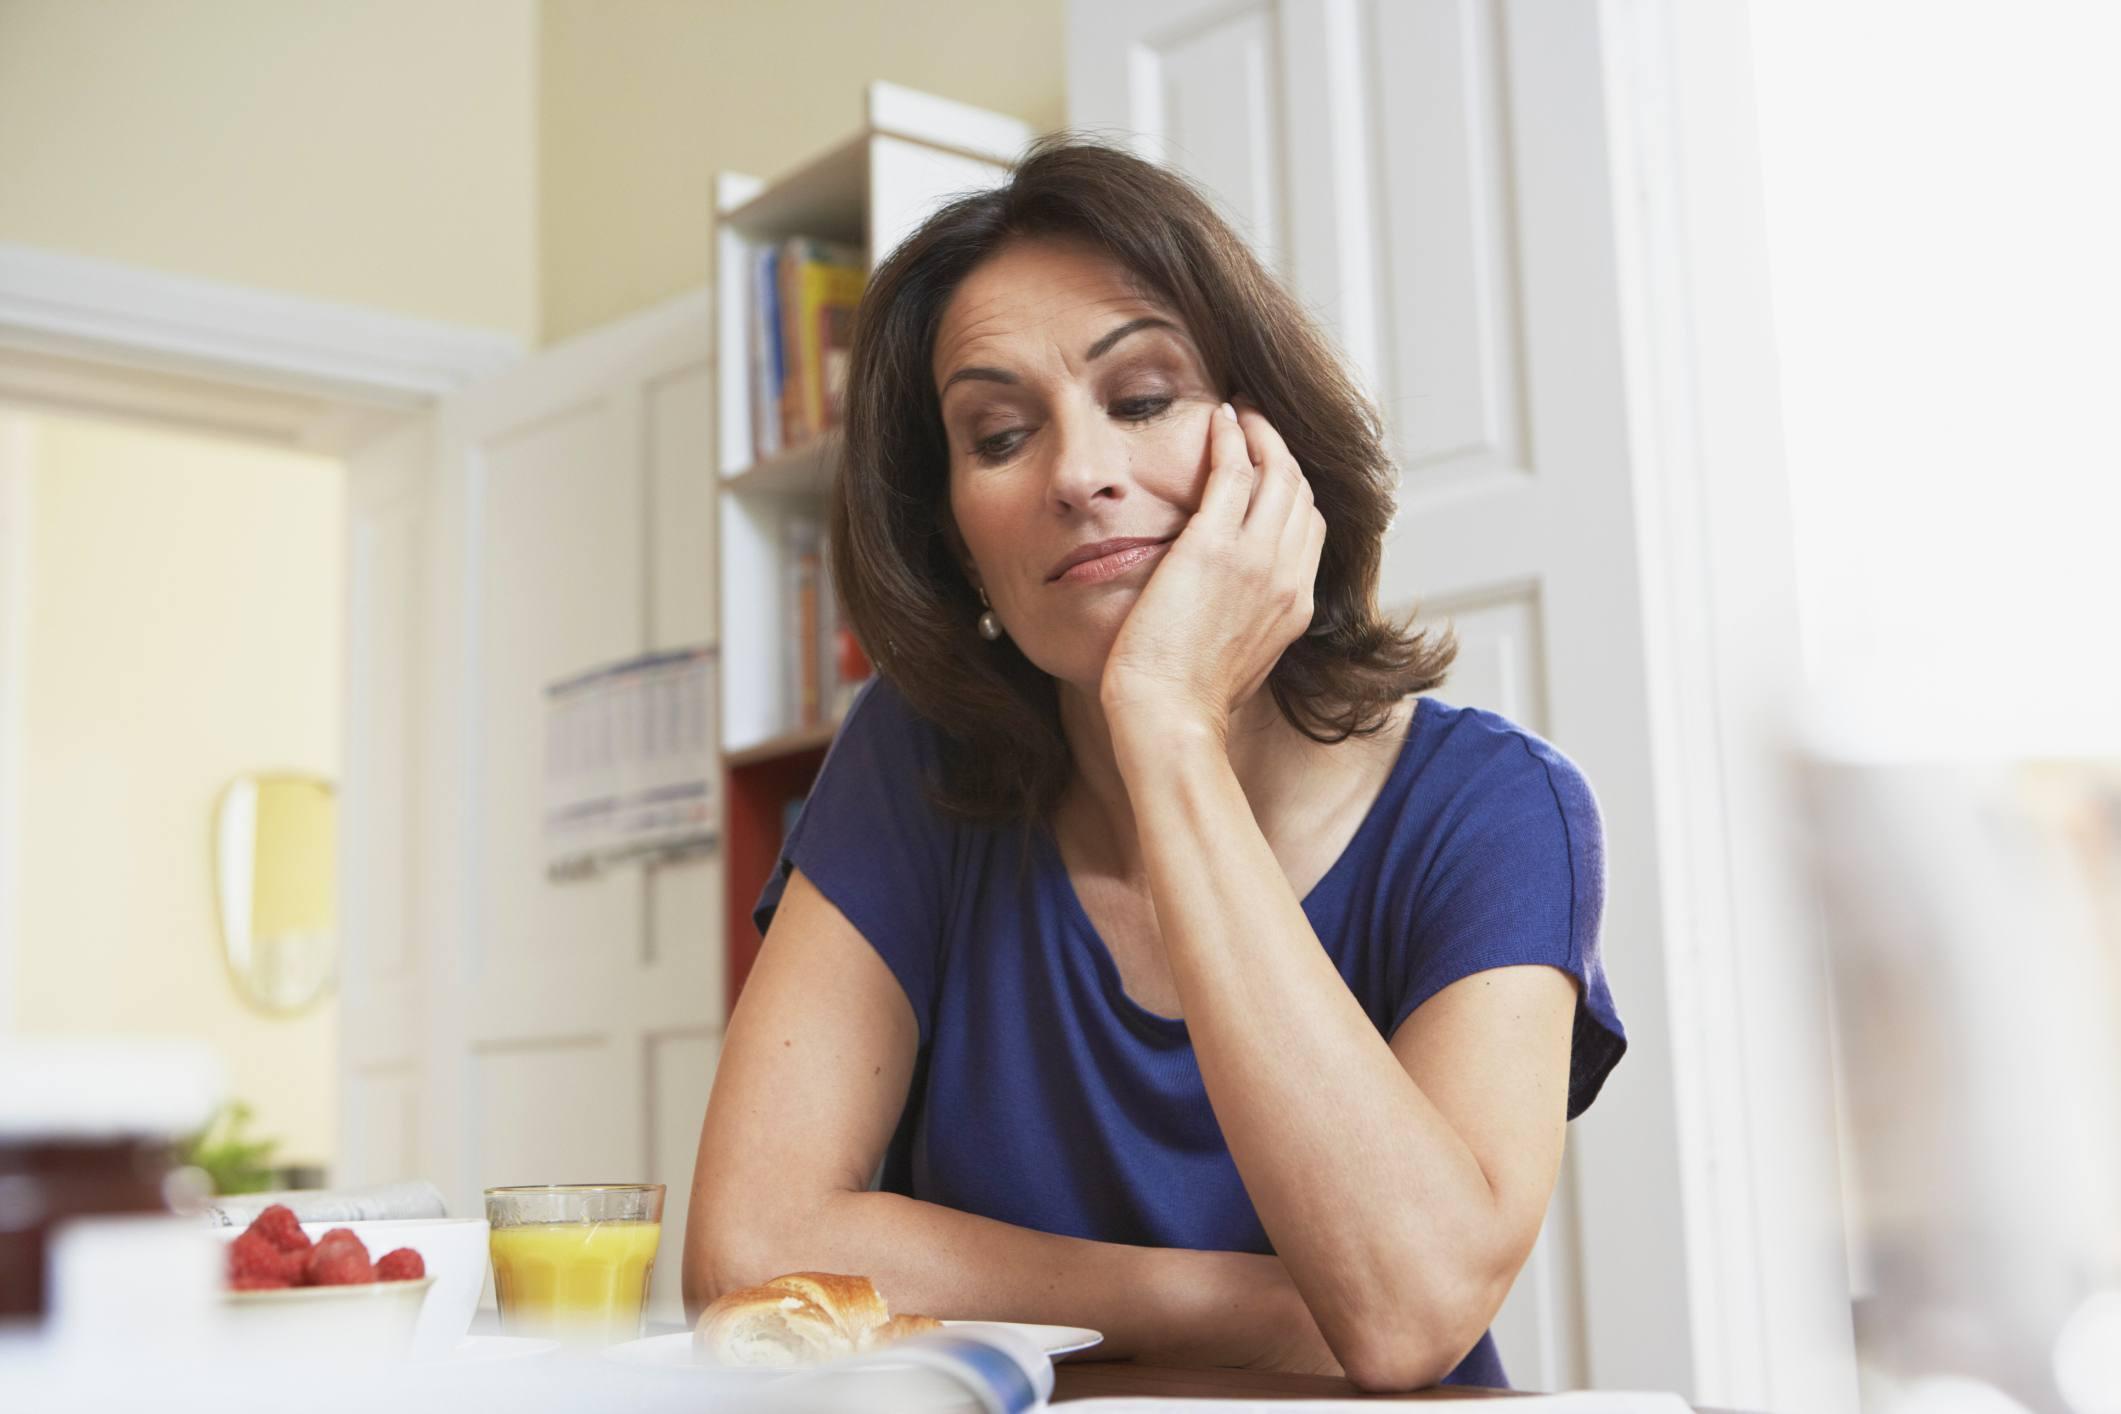 Mujer mirando aburrida, mirando la comida